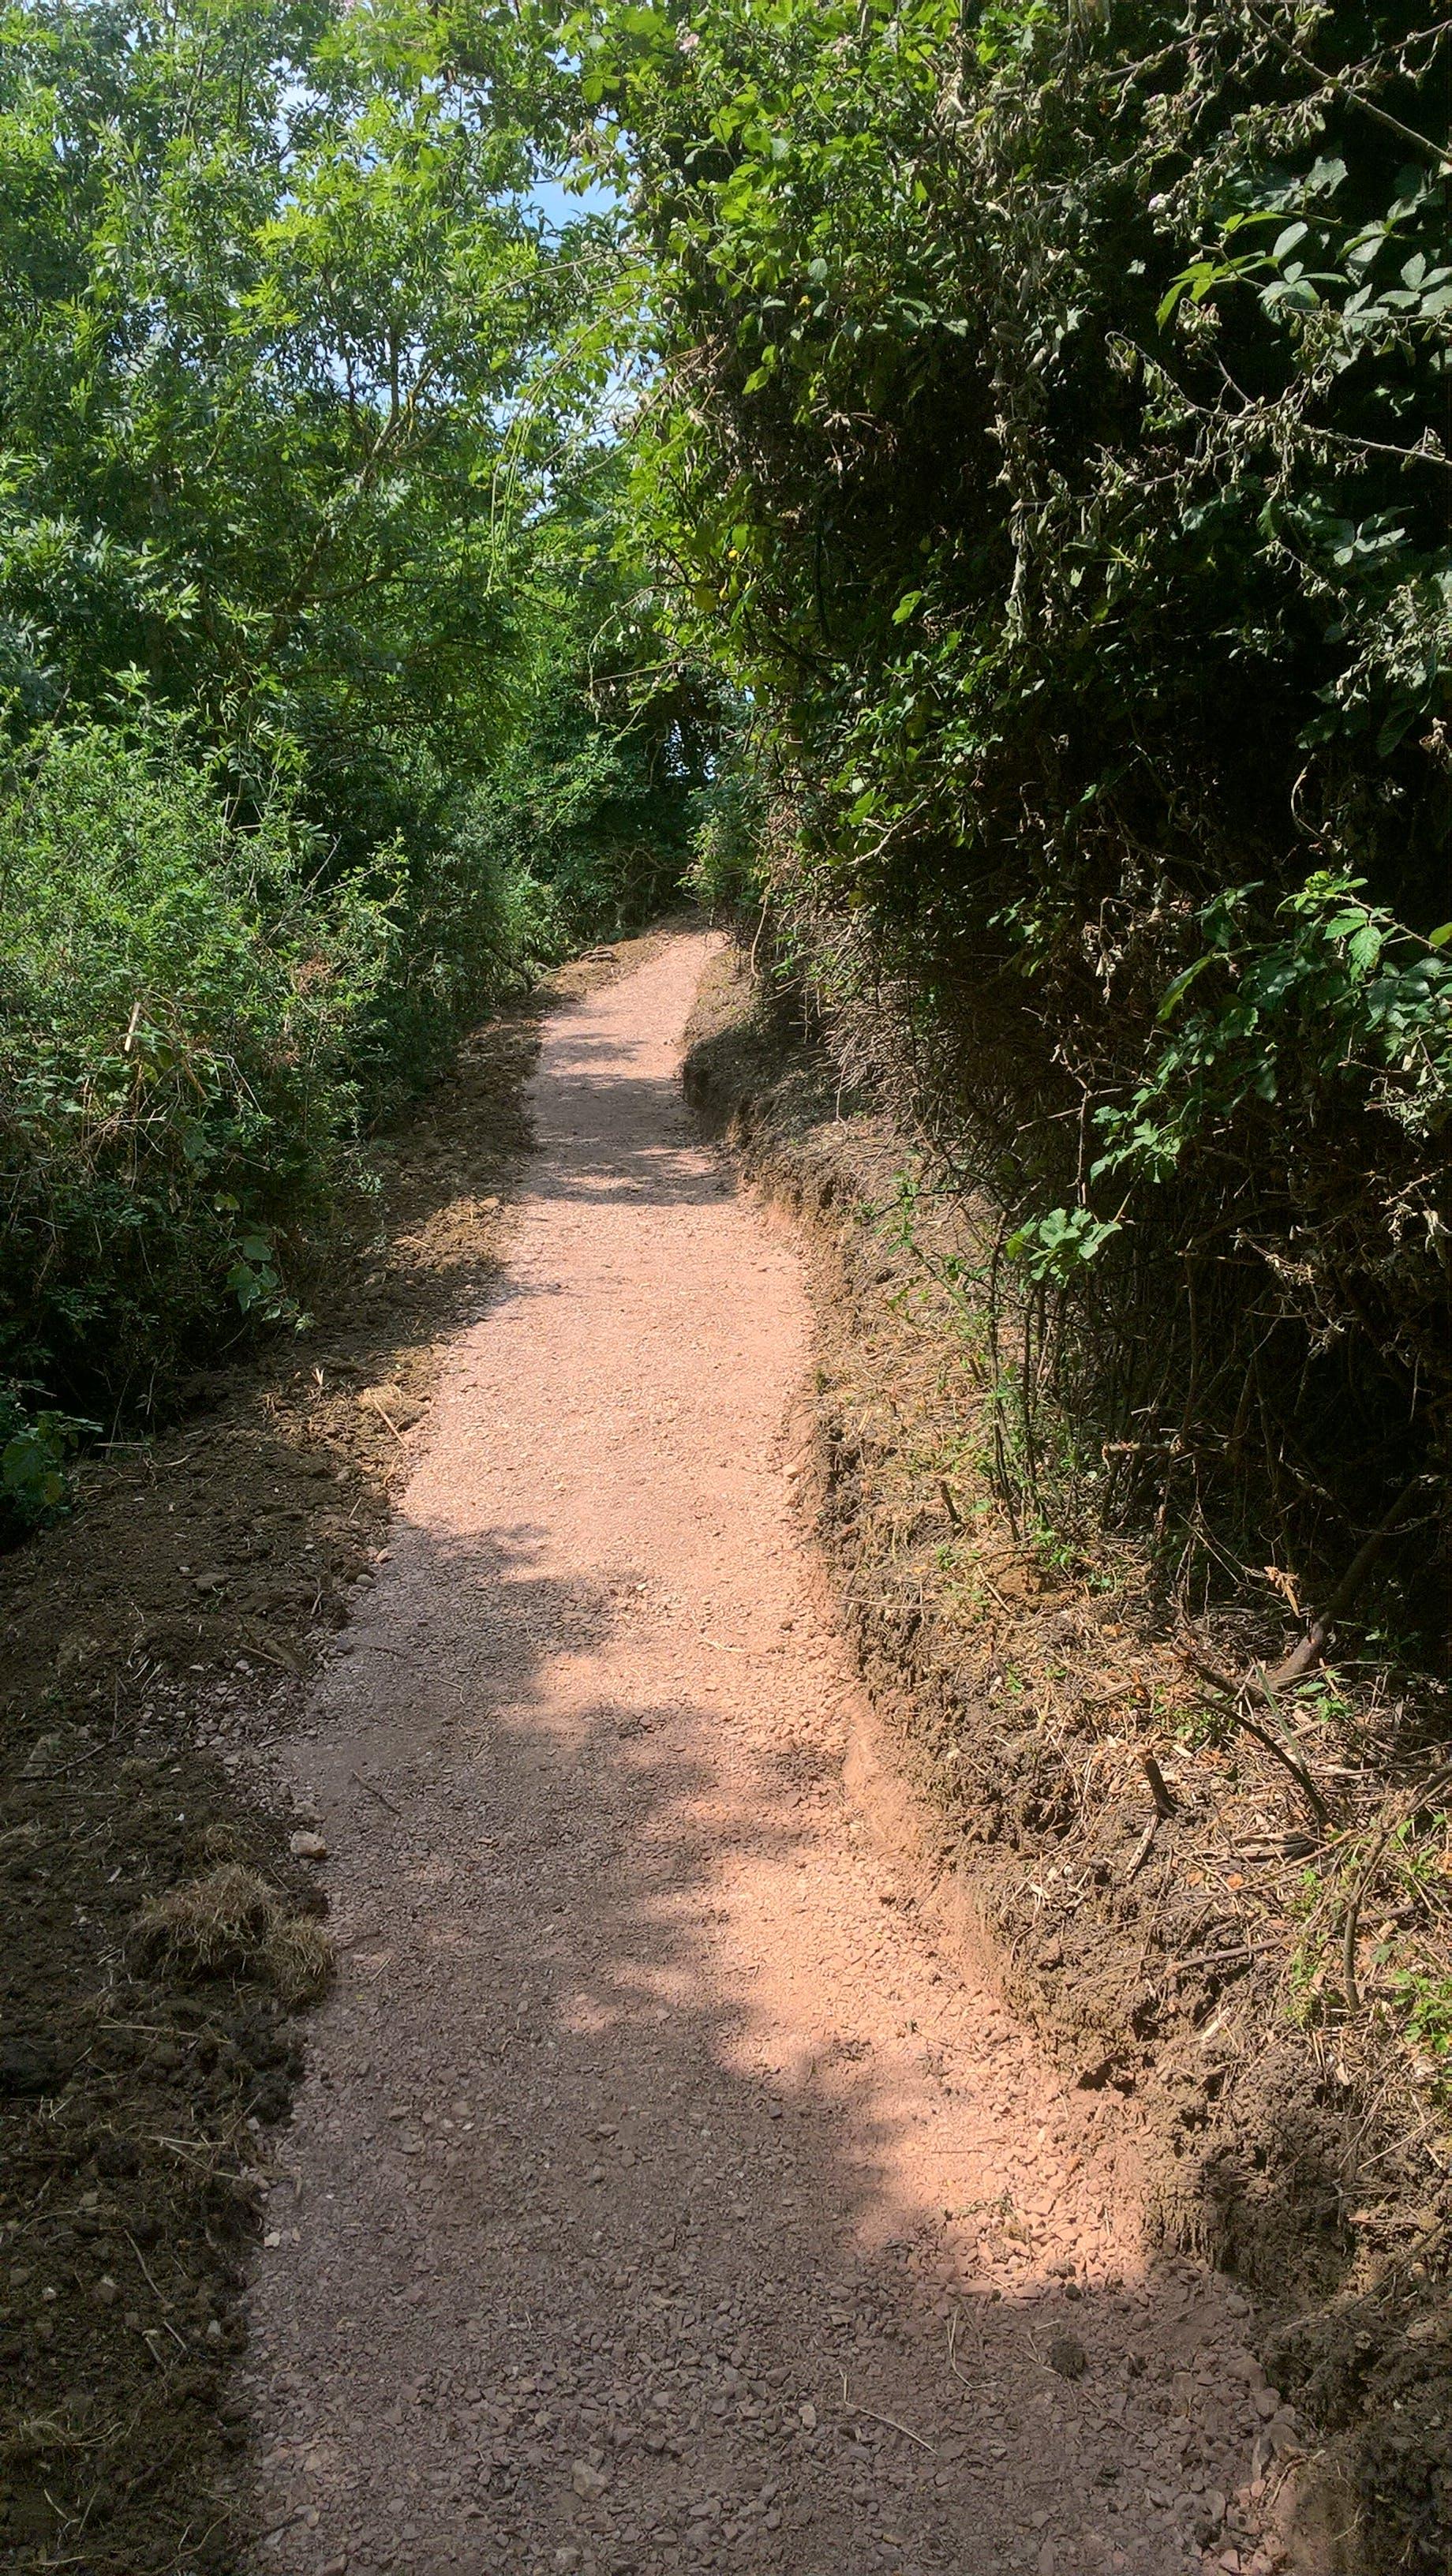 Dorset coast path - after works